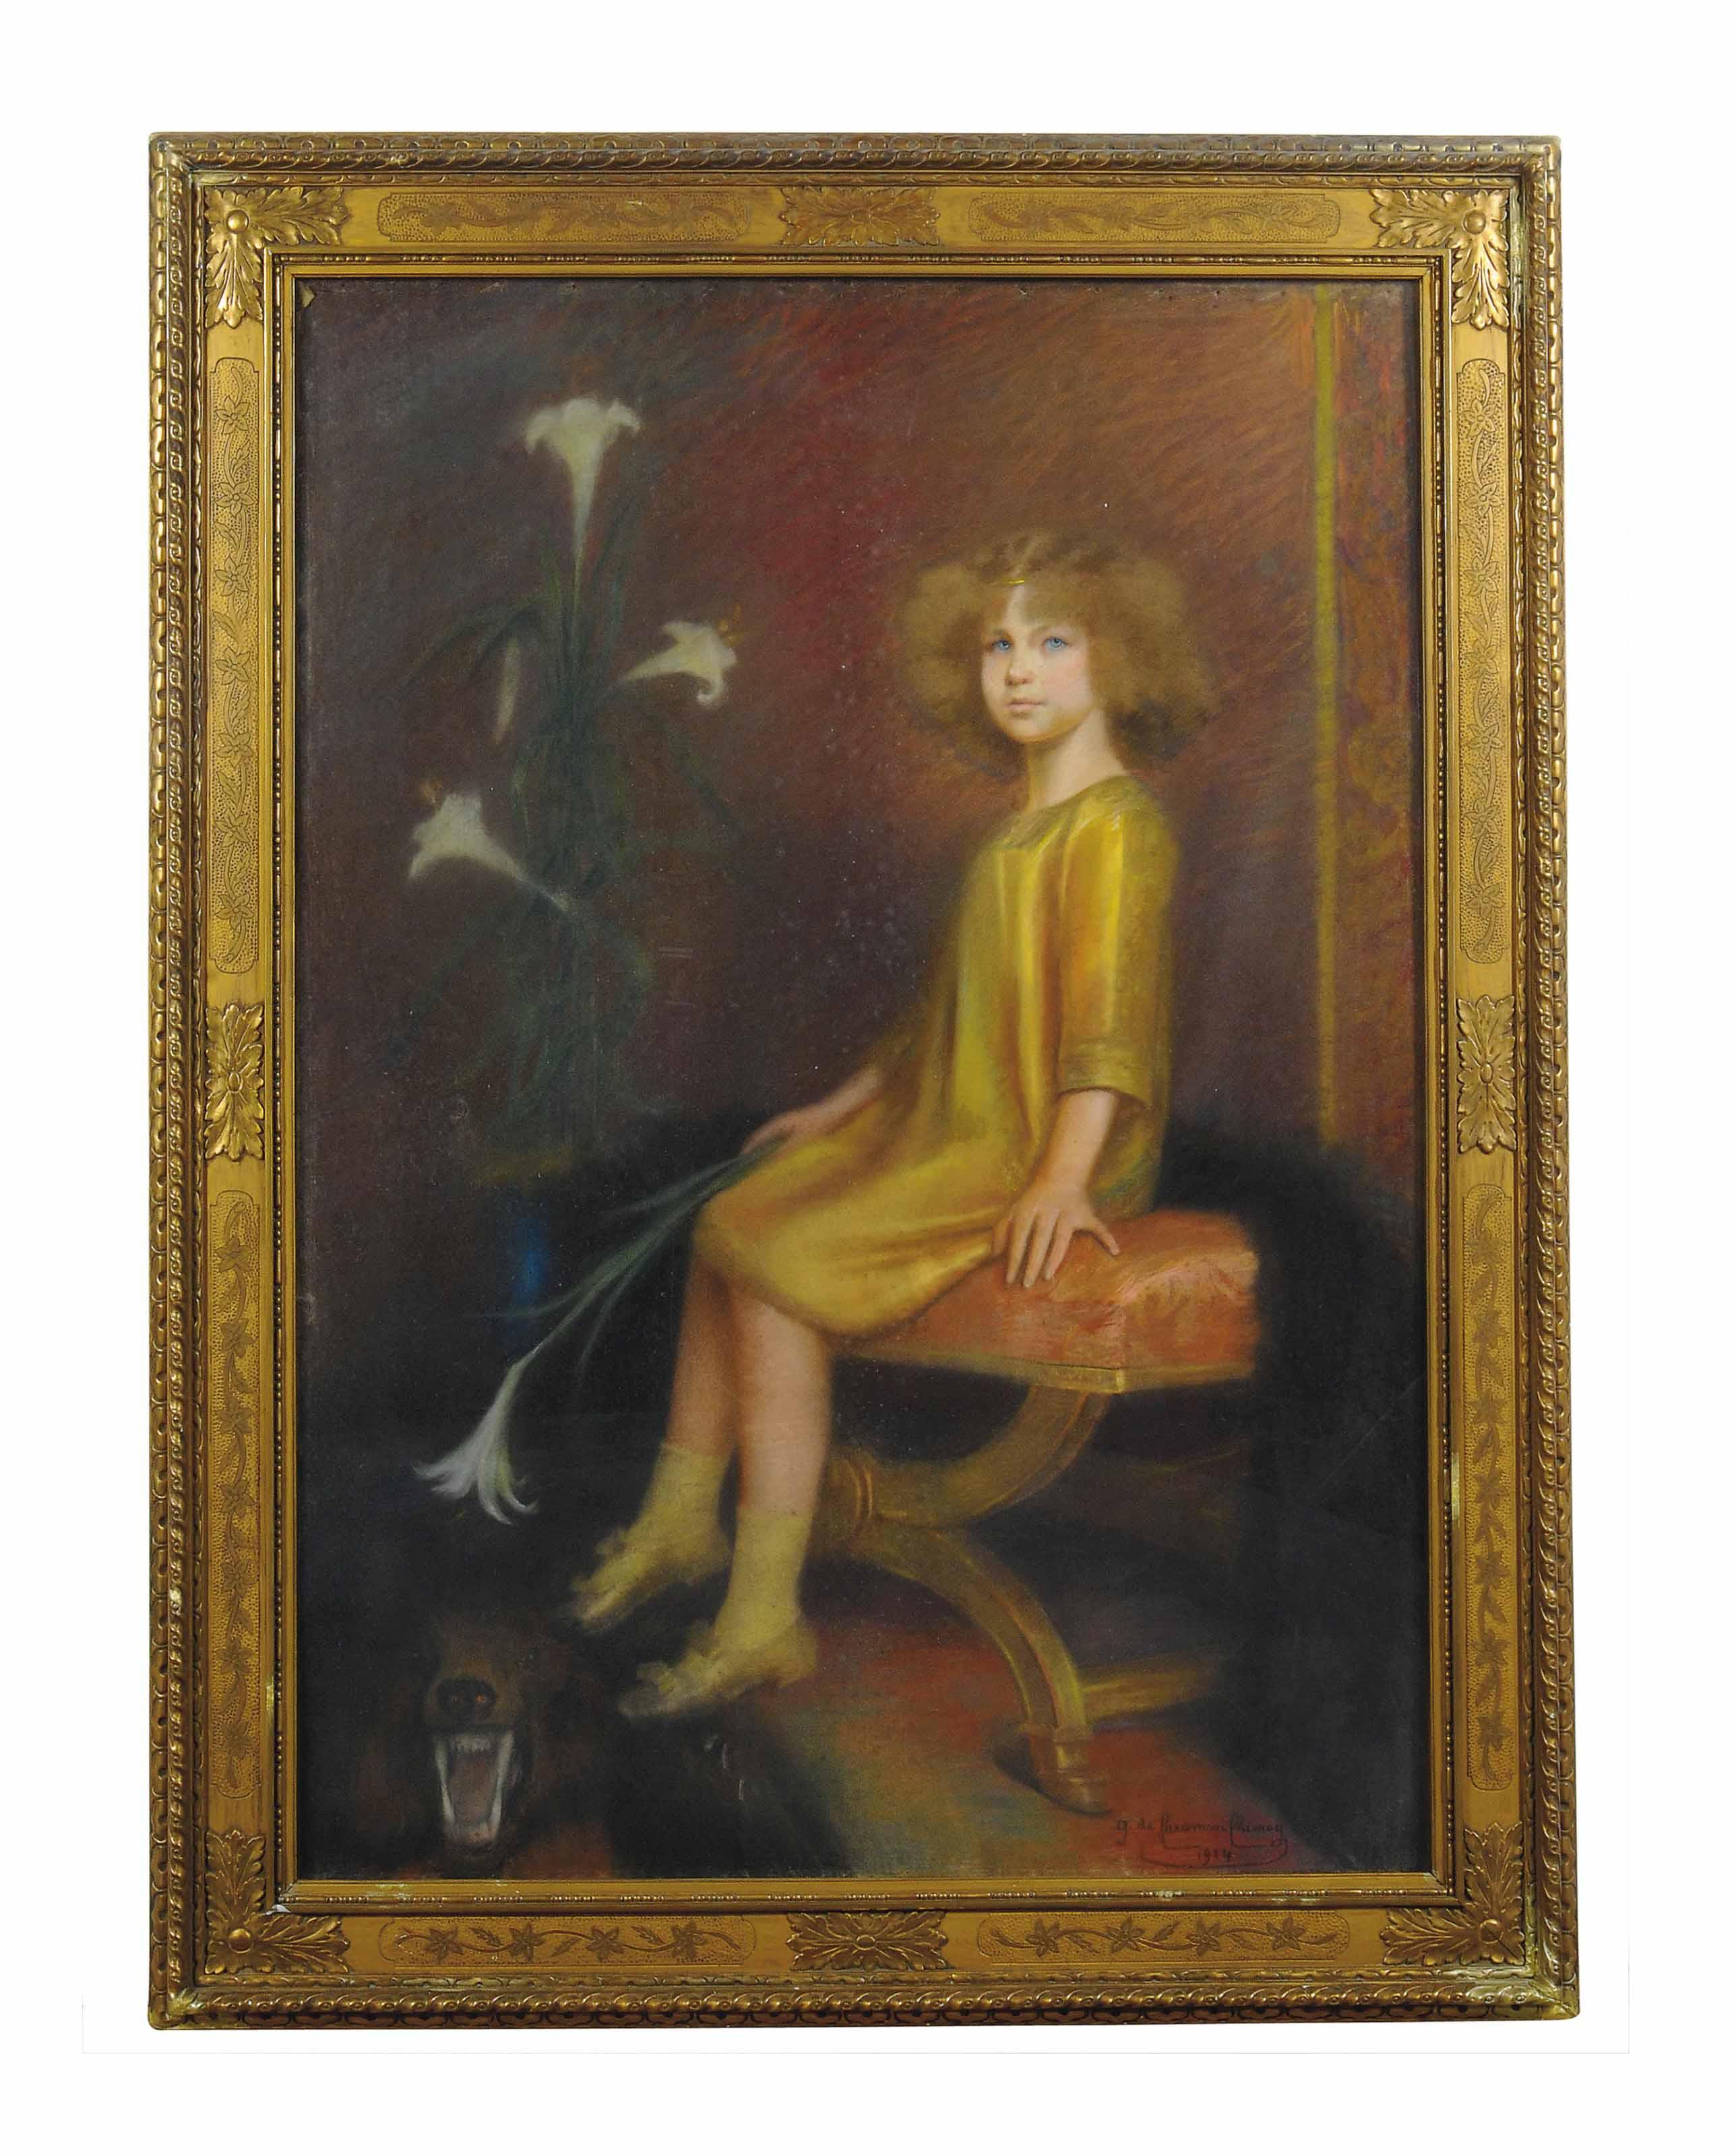 Portrait of Portrait of Marie José of Belgium (1906-2001), seated full-length